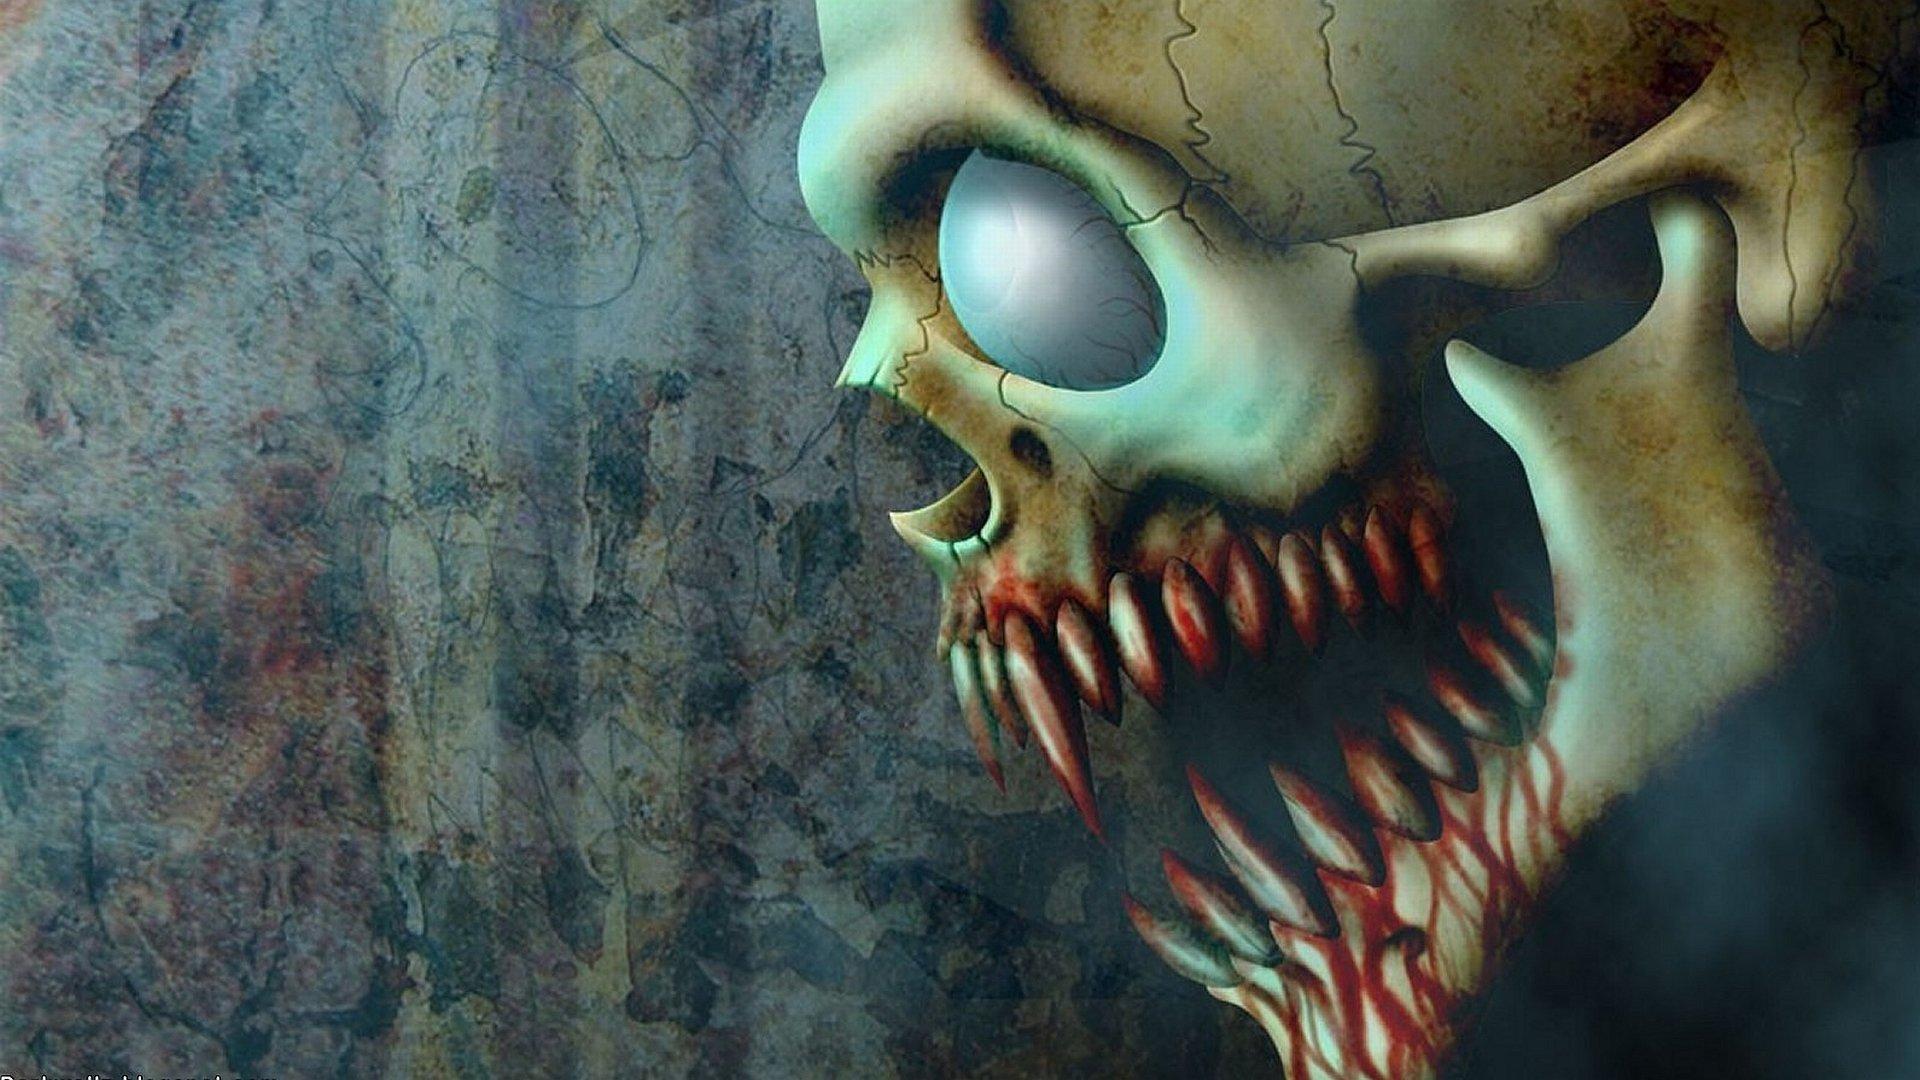 Free Skull High Quality Wallpaper ID320814 For Hd 1920x1080 Desktop